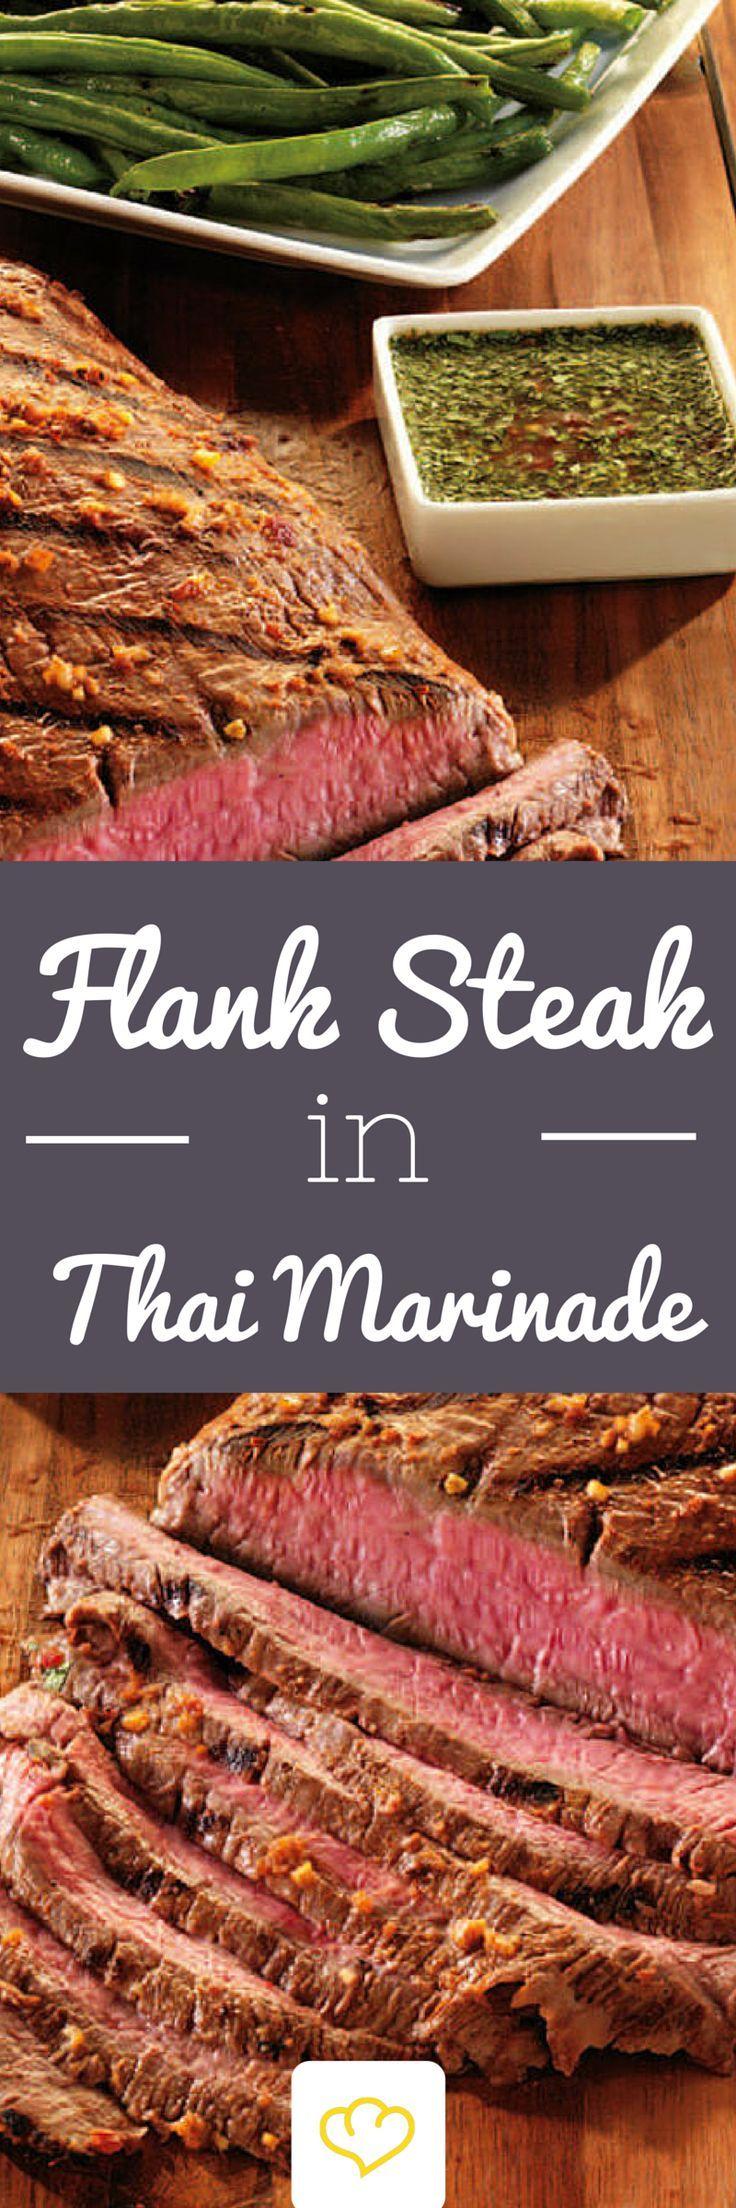 flank steak in thai marinade rezept favorite grillen. Black Bedroom Furniture Sets. Home Design Ideas